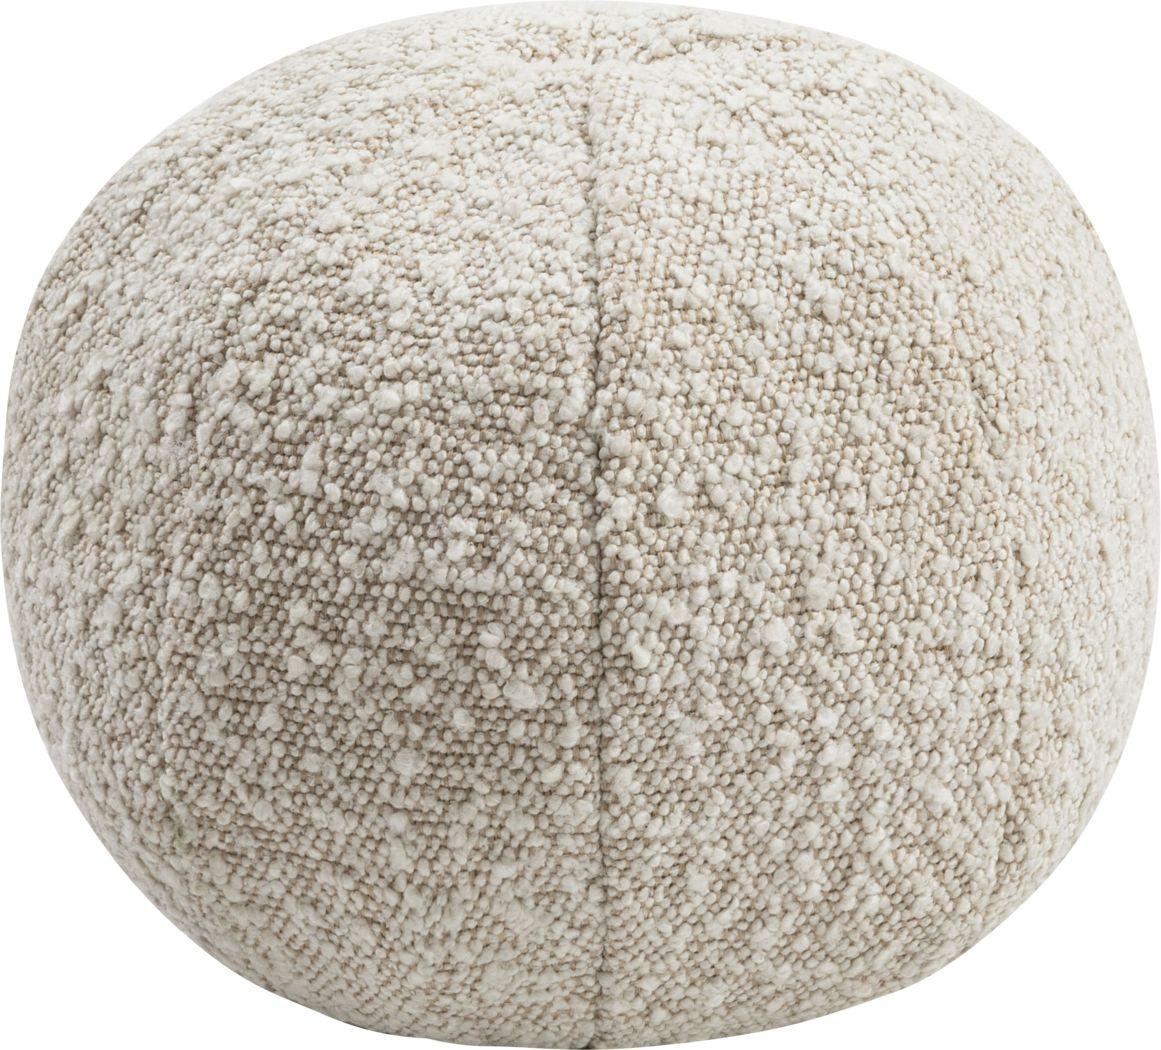 Kids Fuzzy Boba Beige Accent Pillow